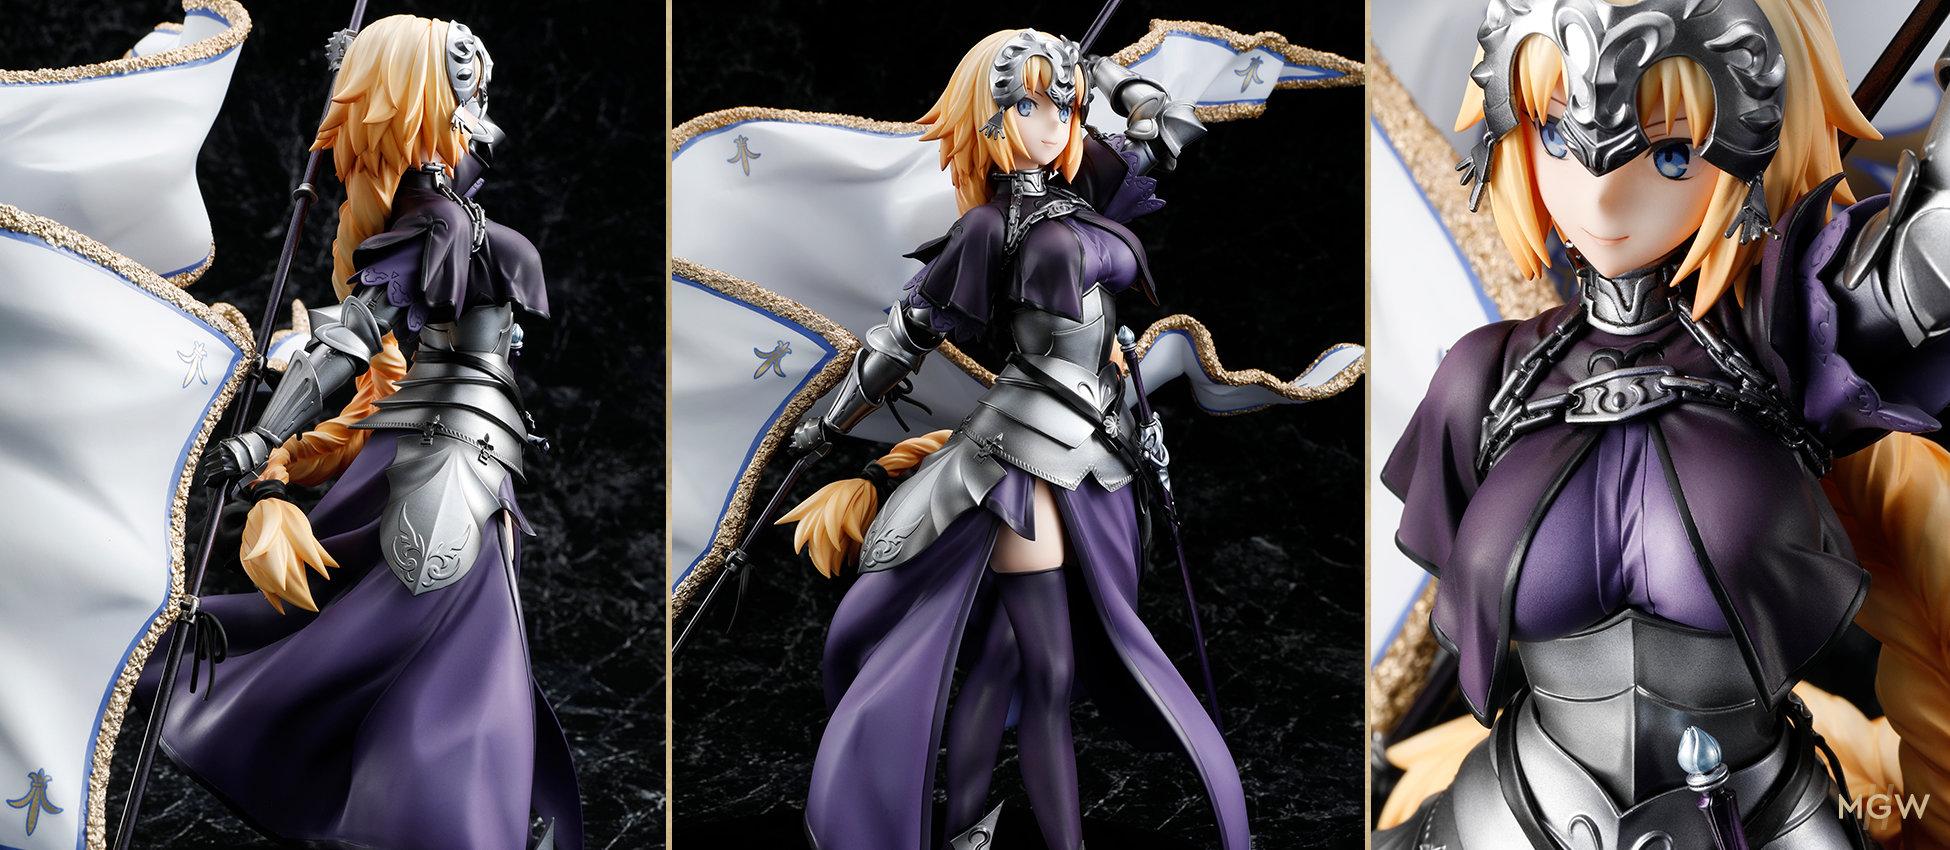 KDcolle Ruler Jeanne dArc by KADOKAWA from Fate Grand Order MyGrailWatch Anime Figure Guide